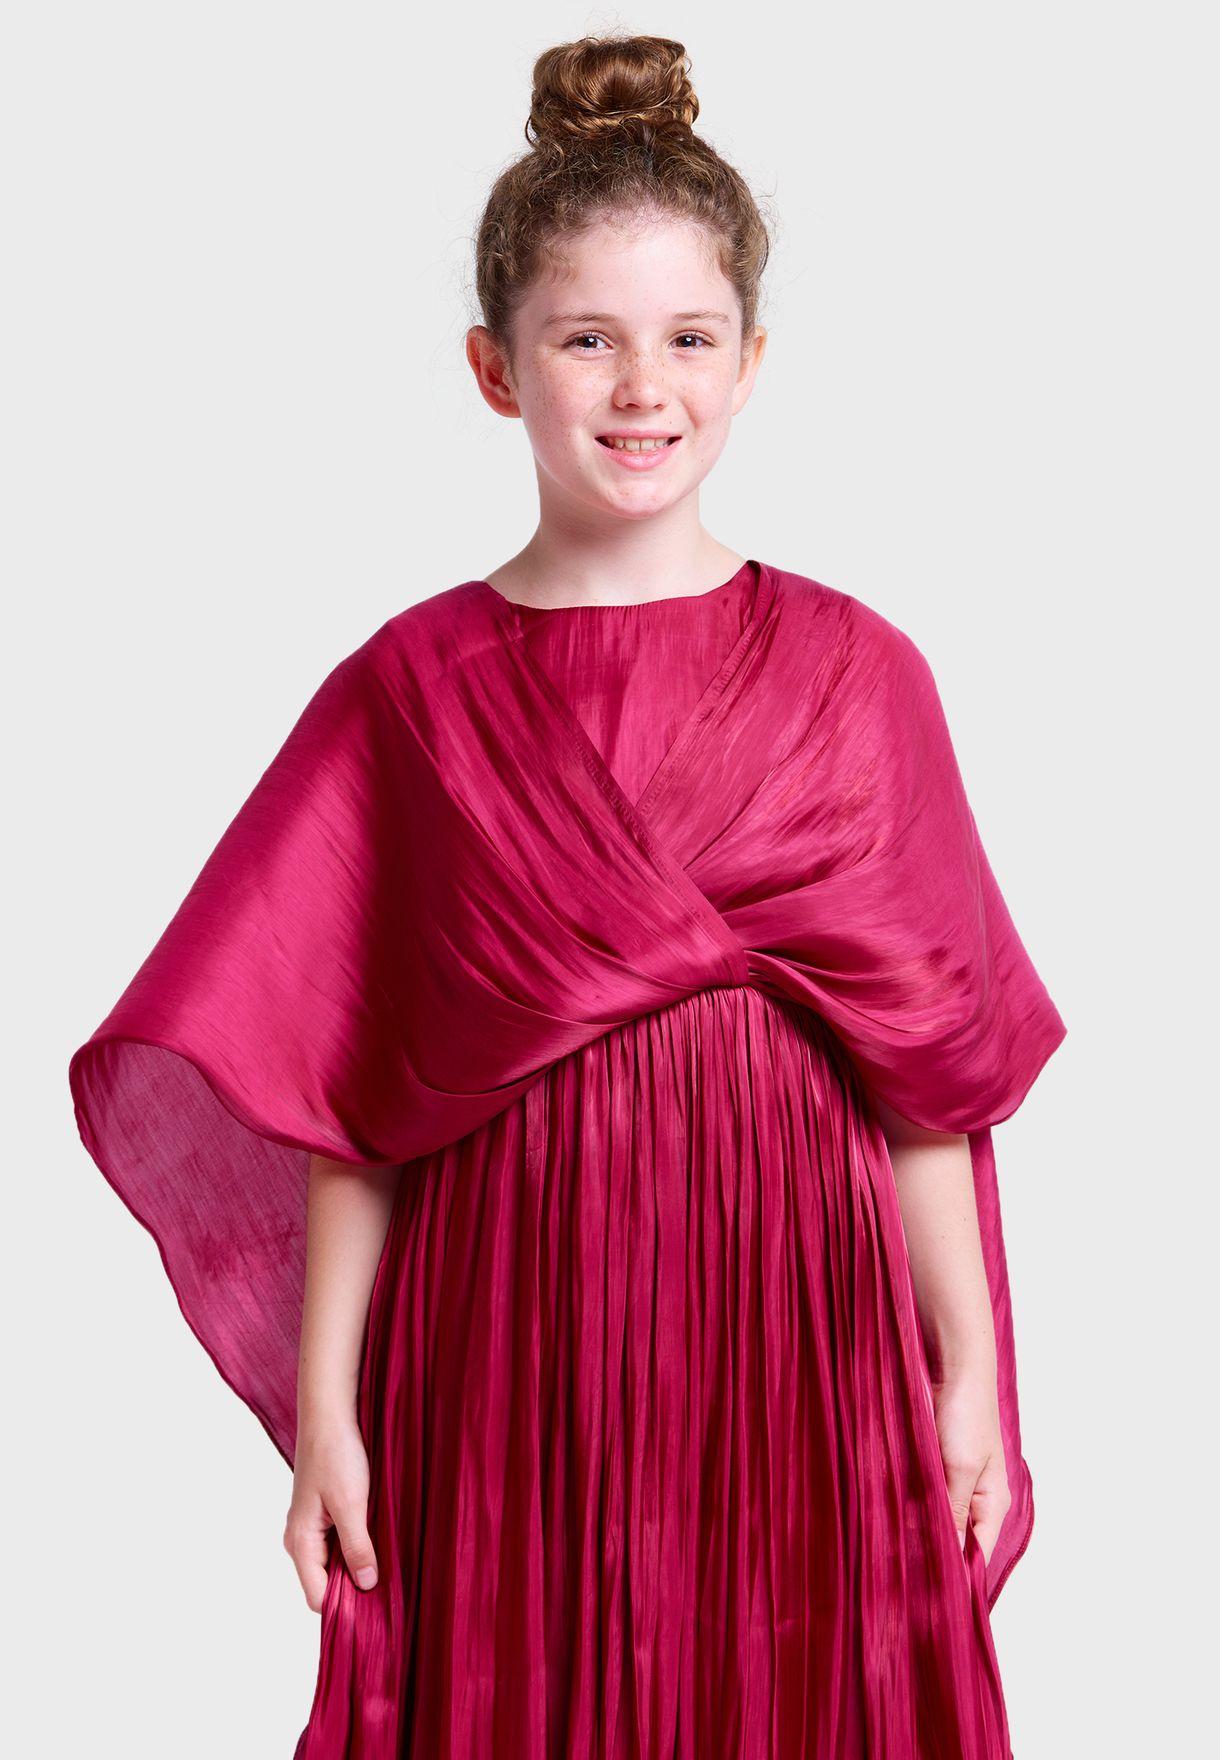 فستان ساتان للاطفال